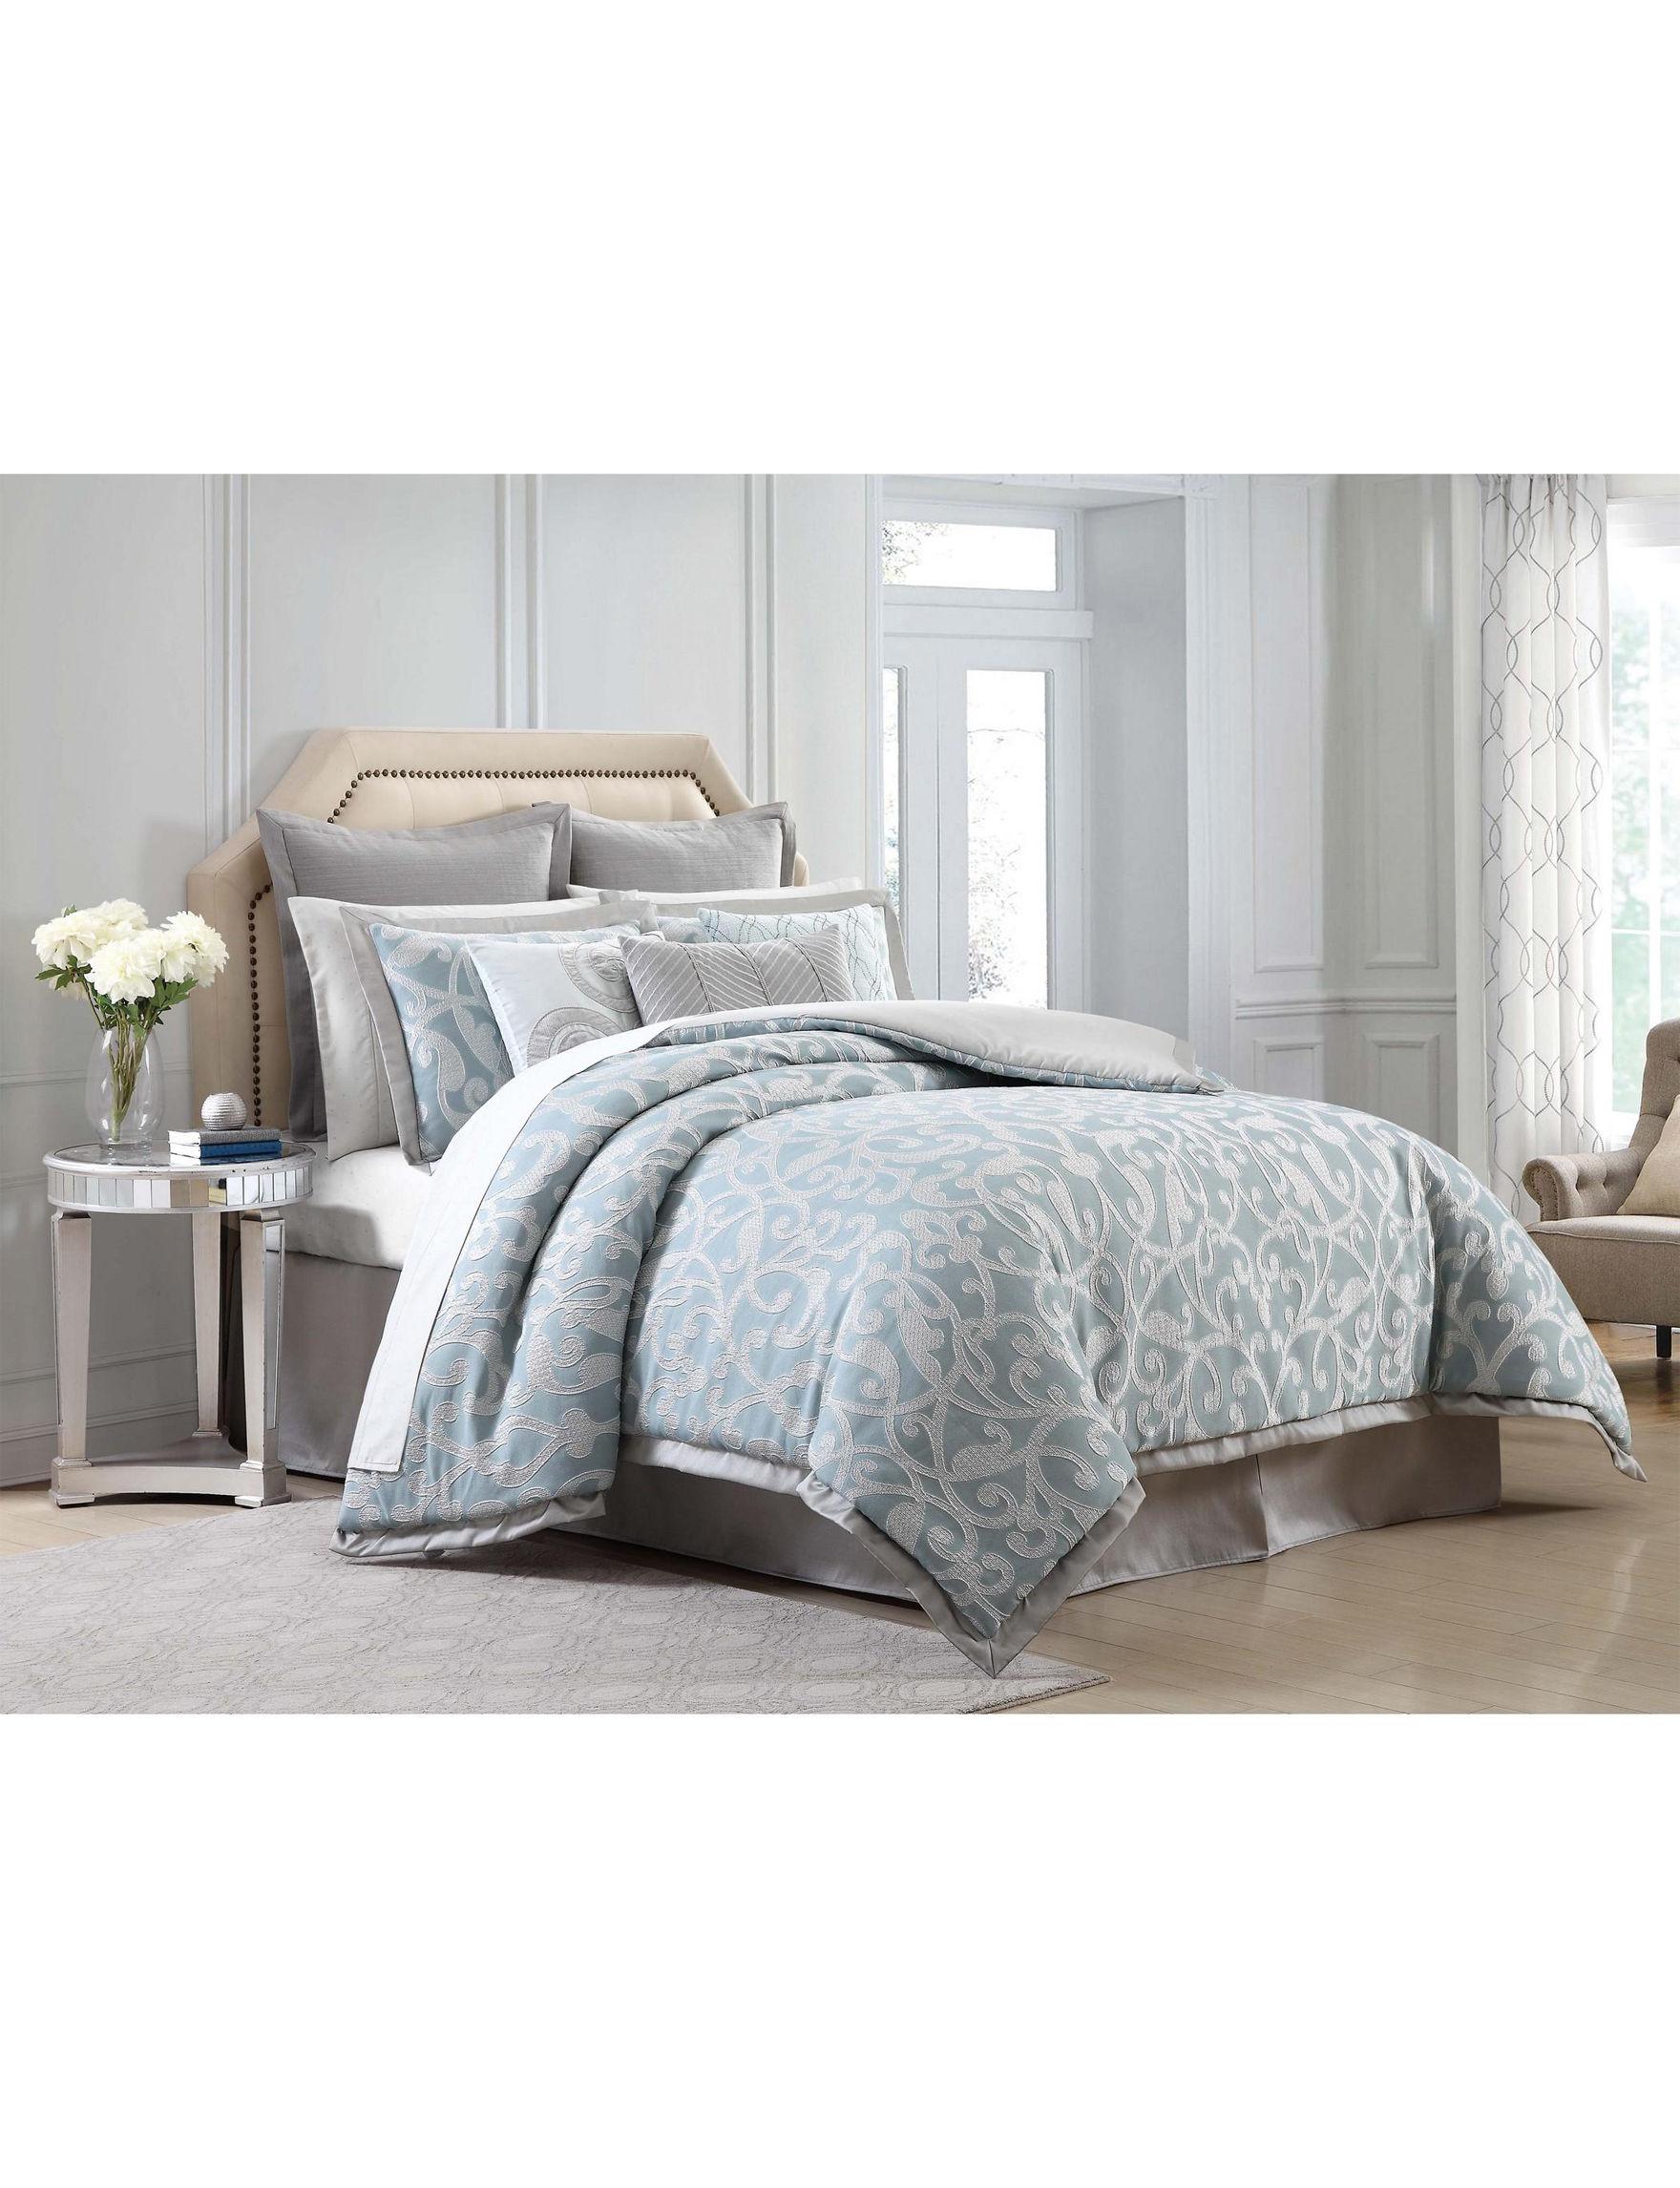 Charisma Blue / White Comforters & Comforter Sets